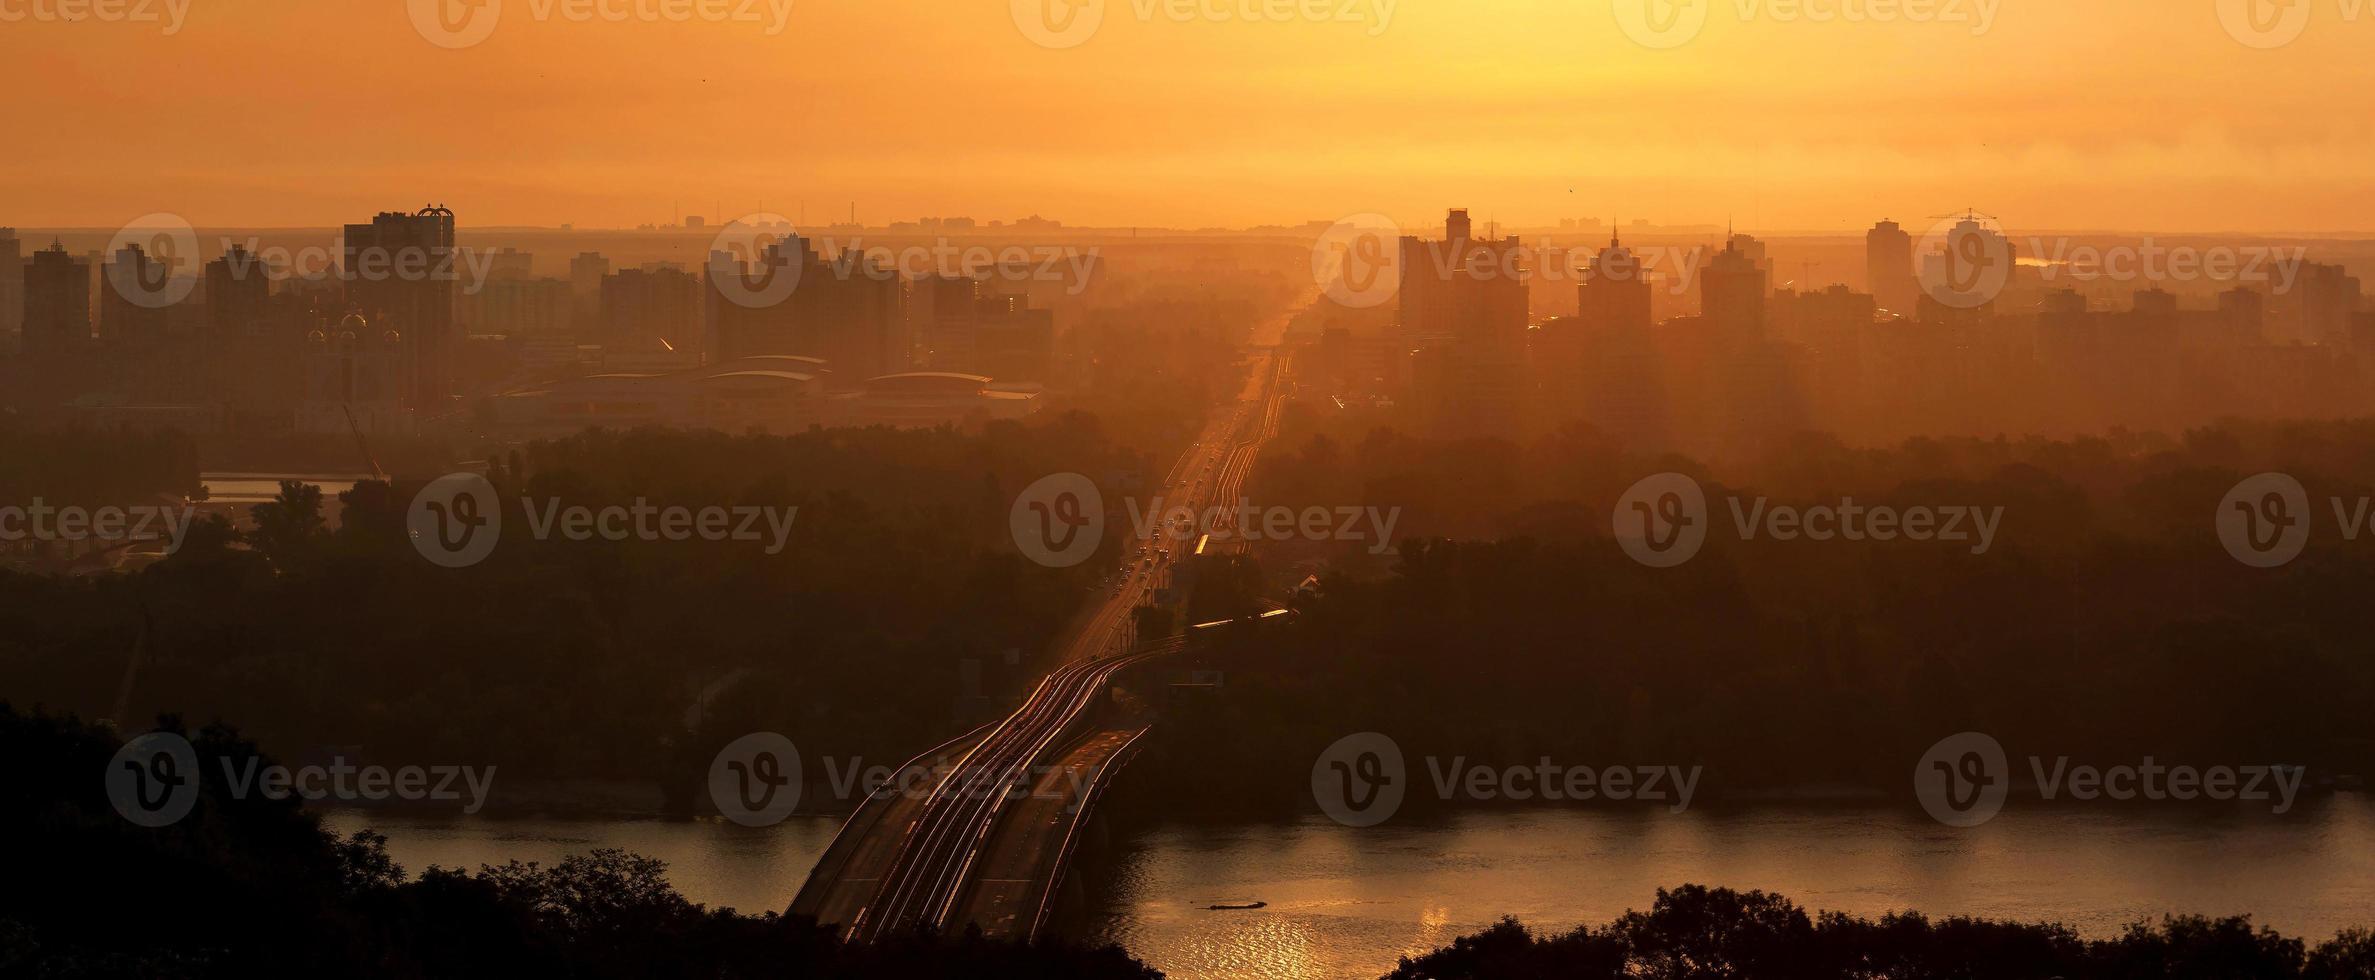 Sonnenaufgang über Kiew. Ukraine foto